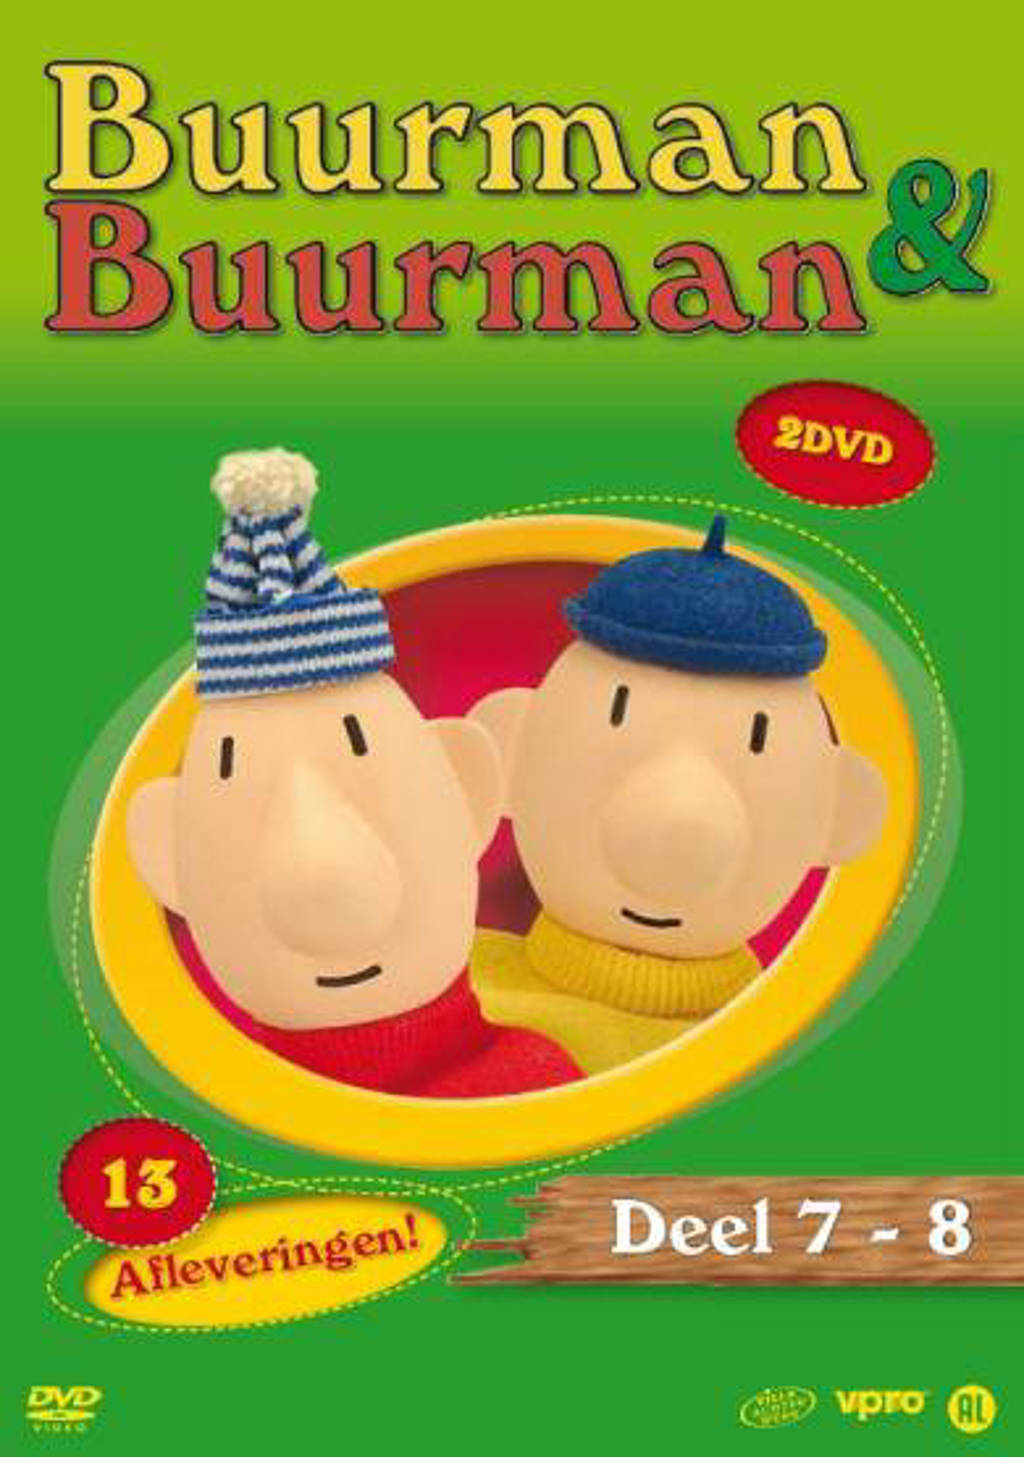 Buurman & Buurman 7 & 8 (DVD)